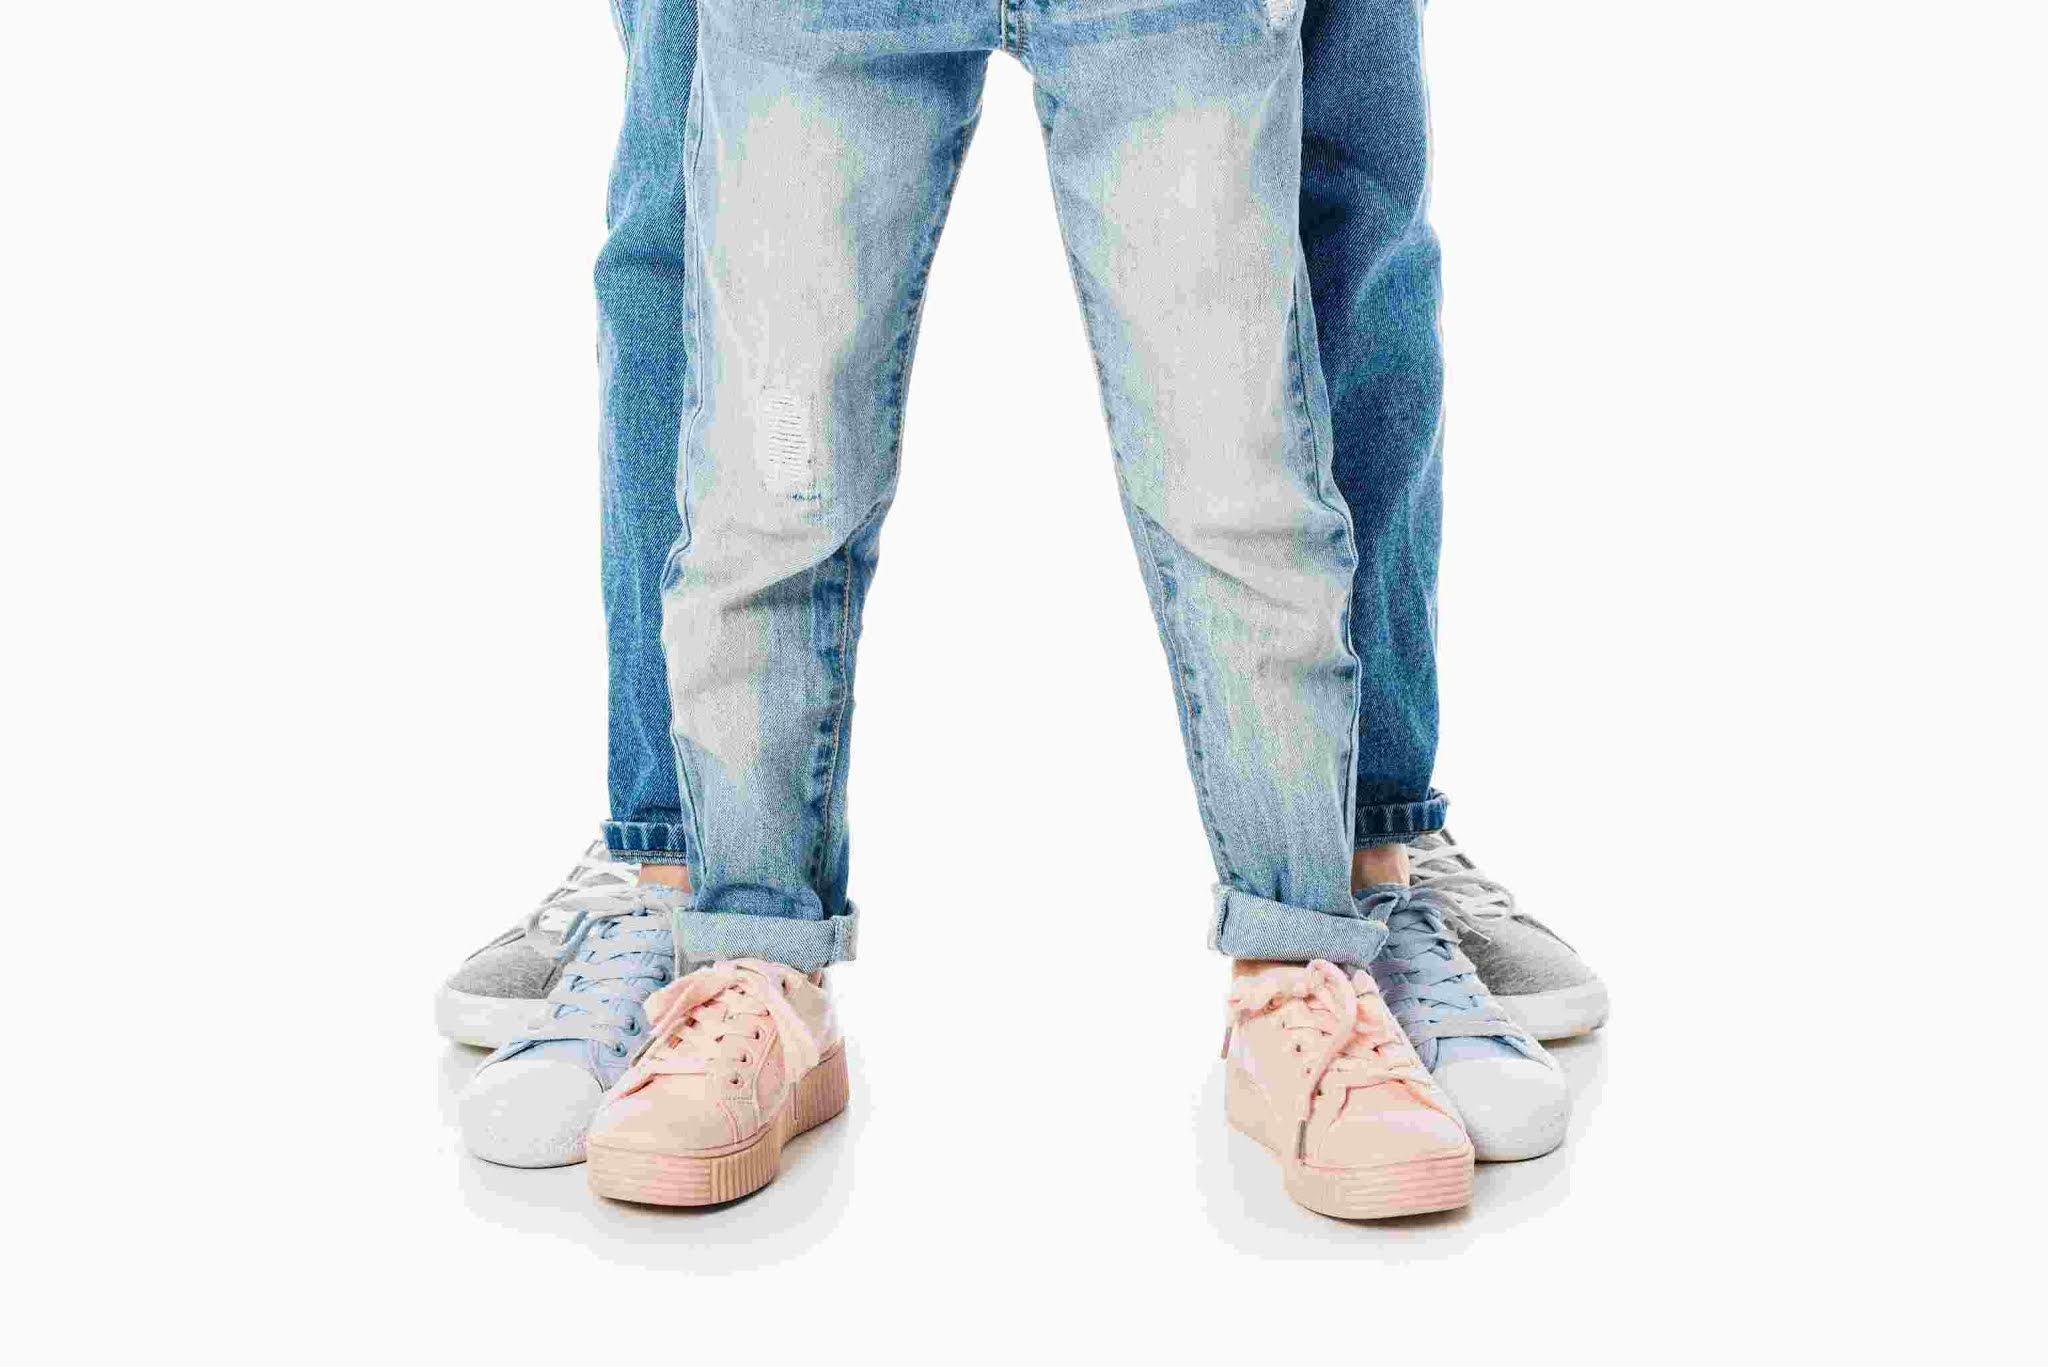 jeans, cloths, captions, outfit, bottom wear, style, denim jeans, fabric, blue jeans